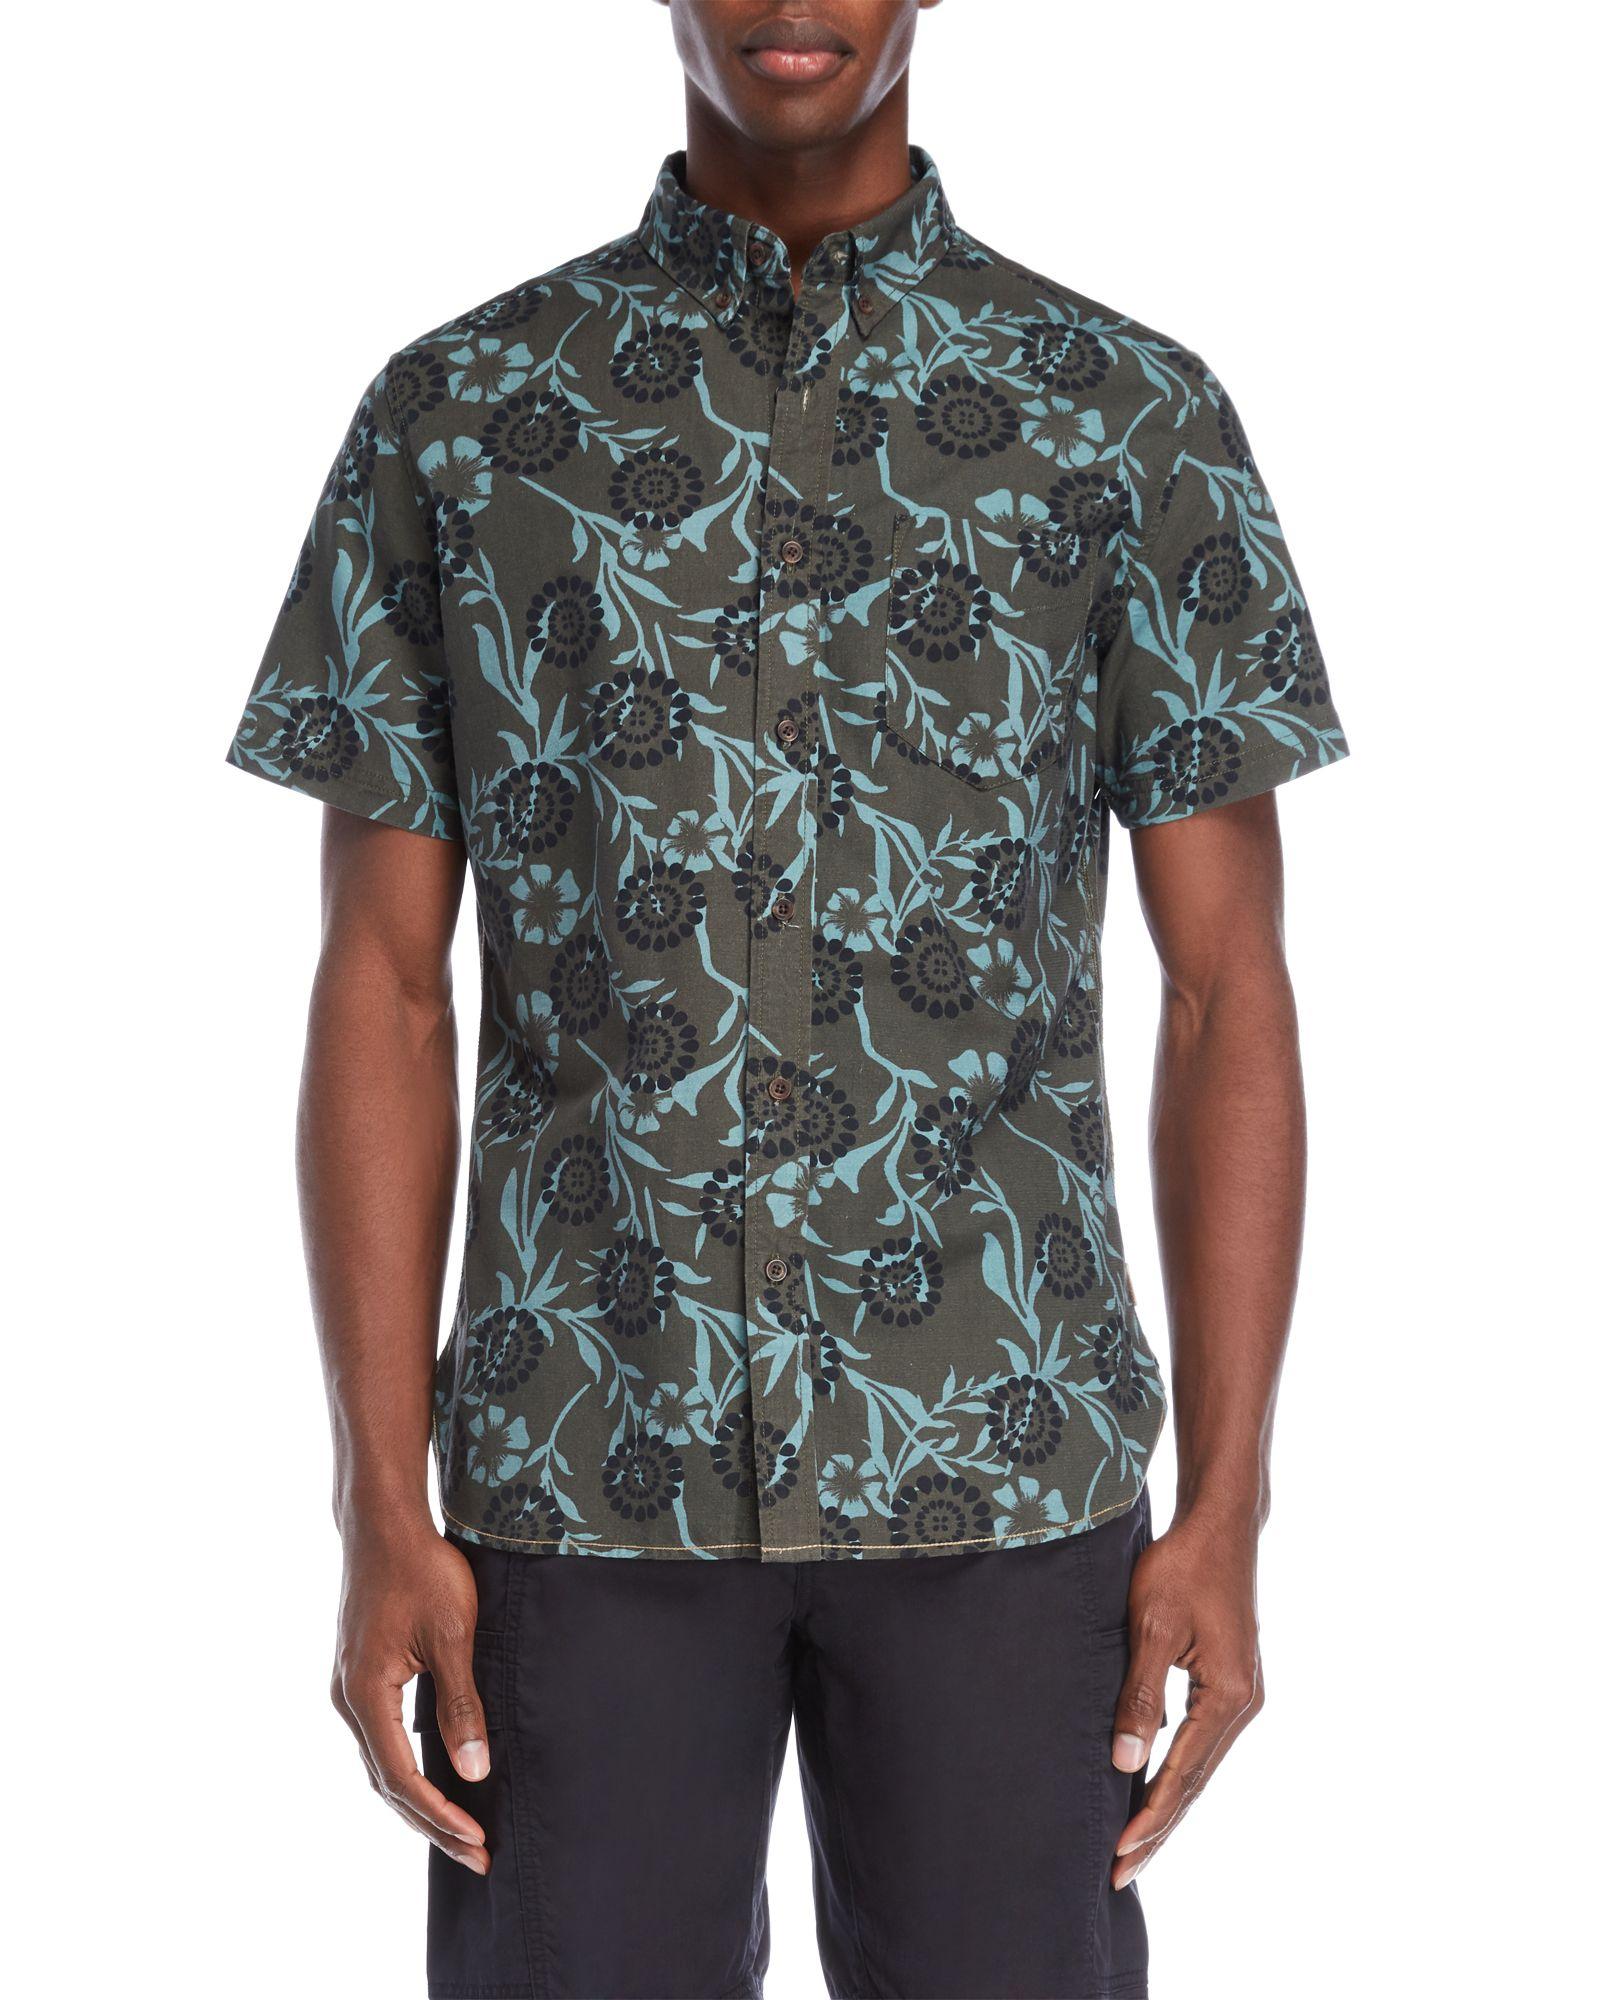 Surfside Supply Flower Batik Short Sleeve Shirt | *Apparel